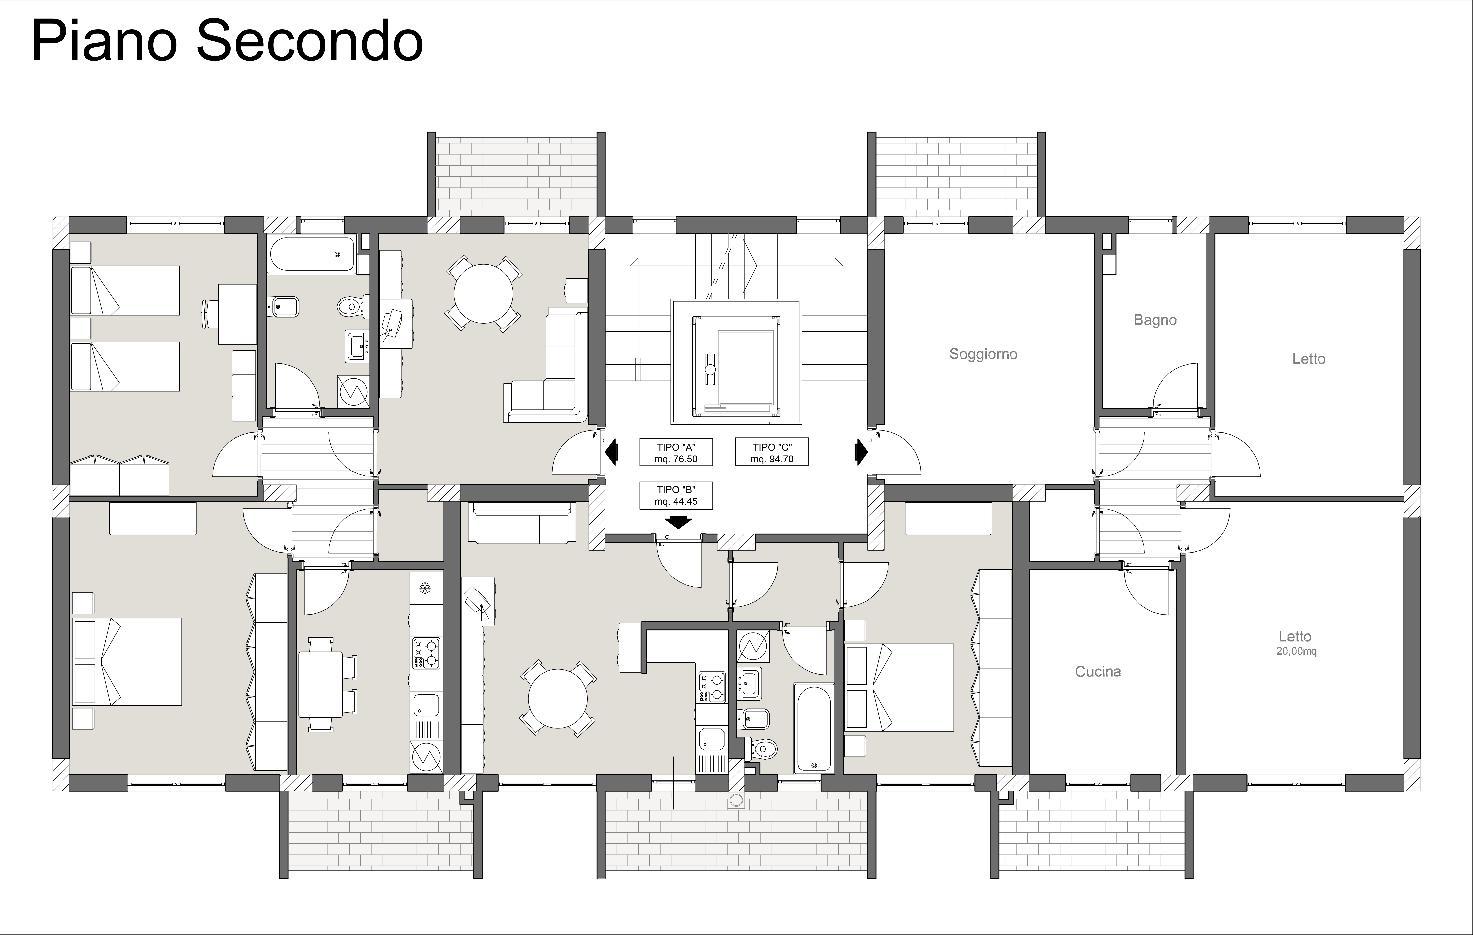 Pianta piano secondo-Palazzina1-2-3-abitarevillafrancatirrena